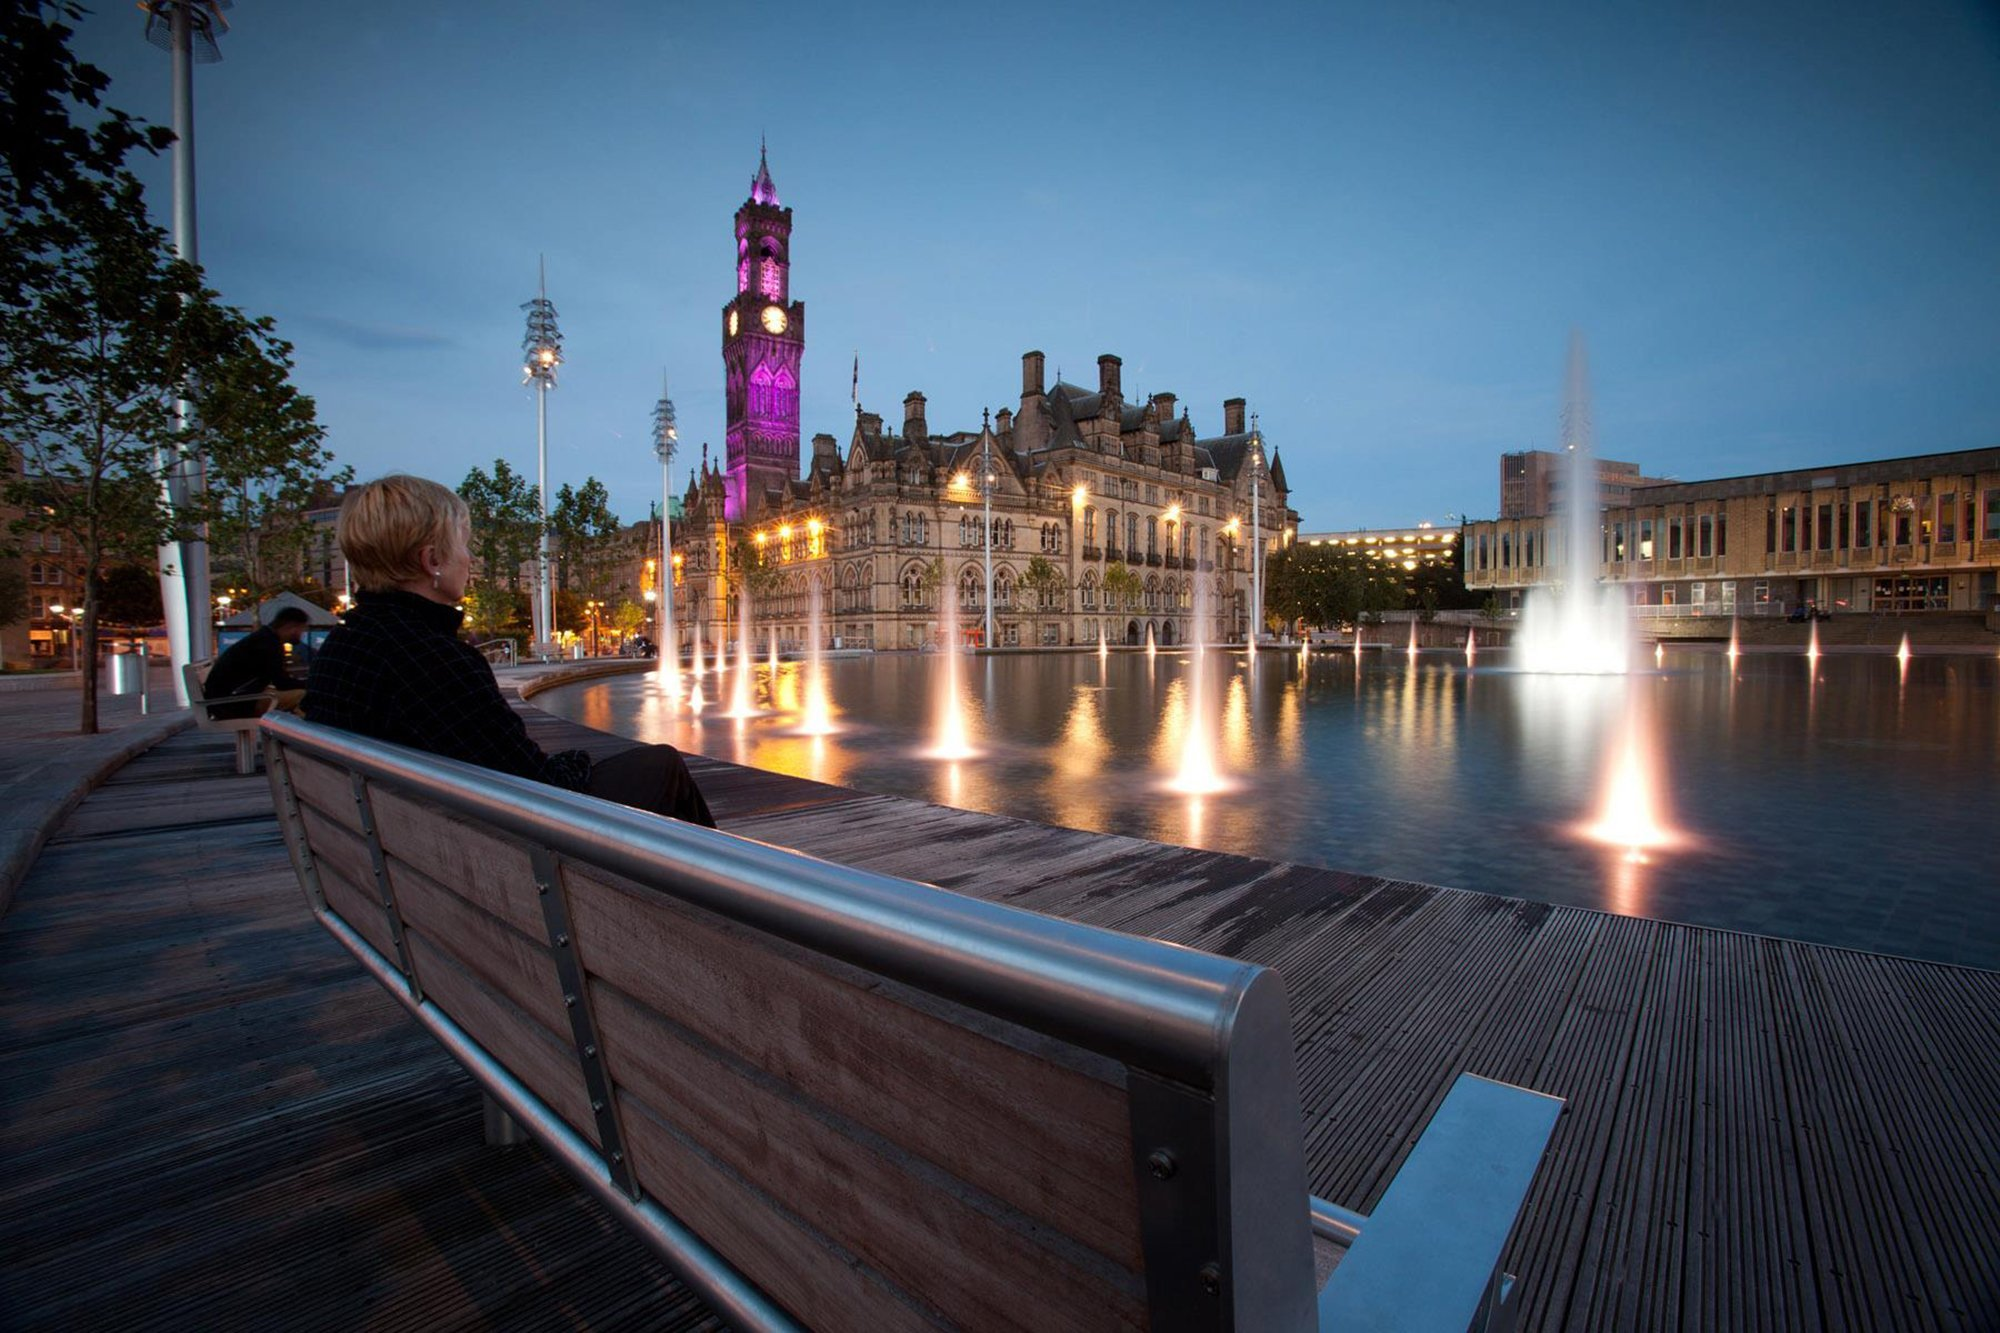 Bailey Streetscene - helping set the benchmark in Bradford